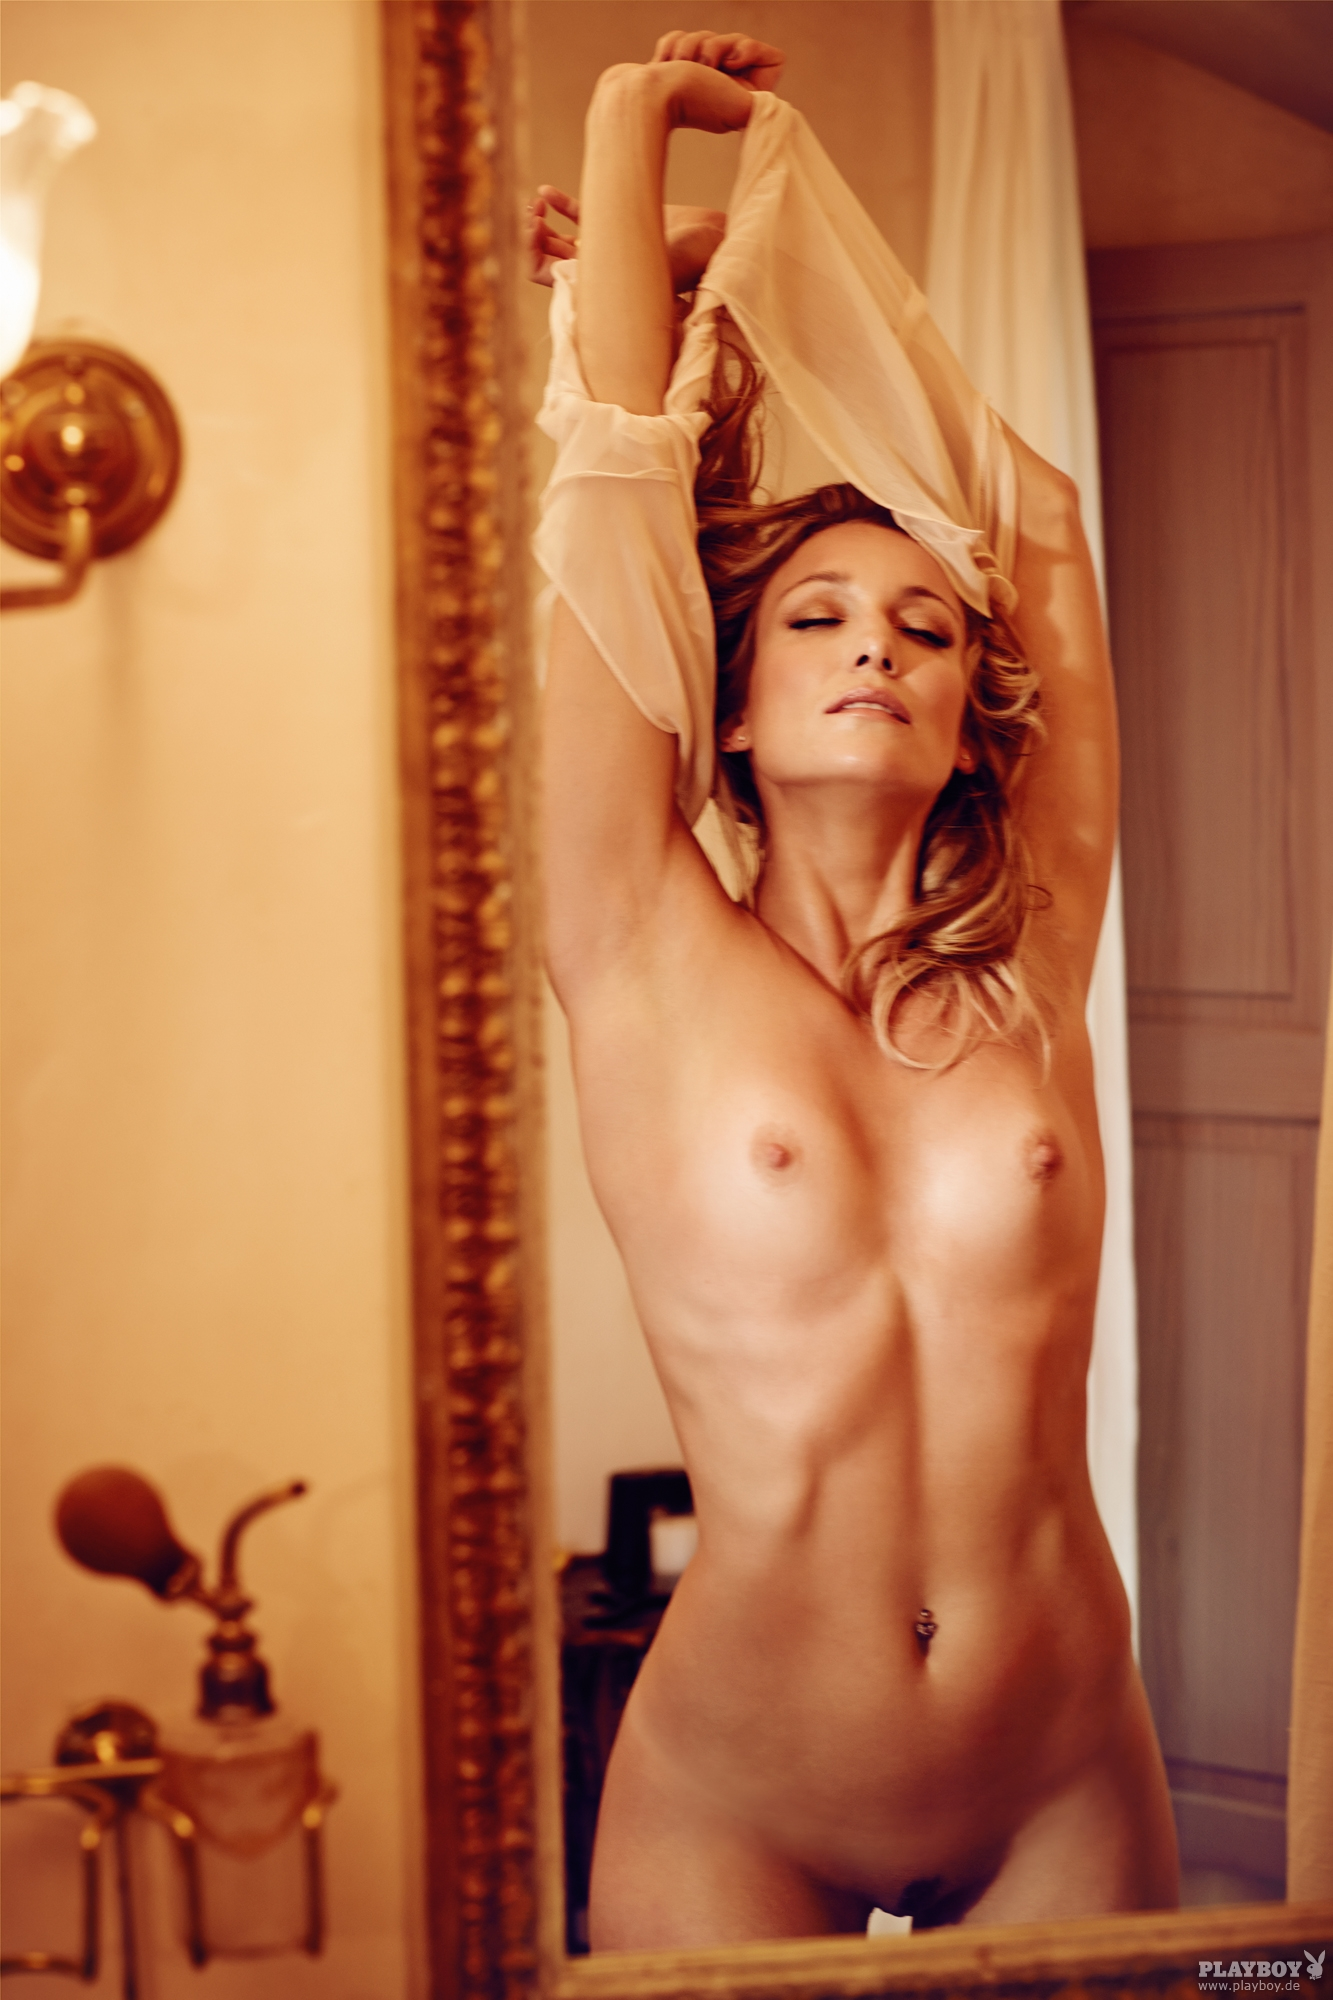 Kristine hermosa naked thumb